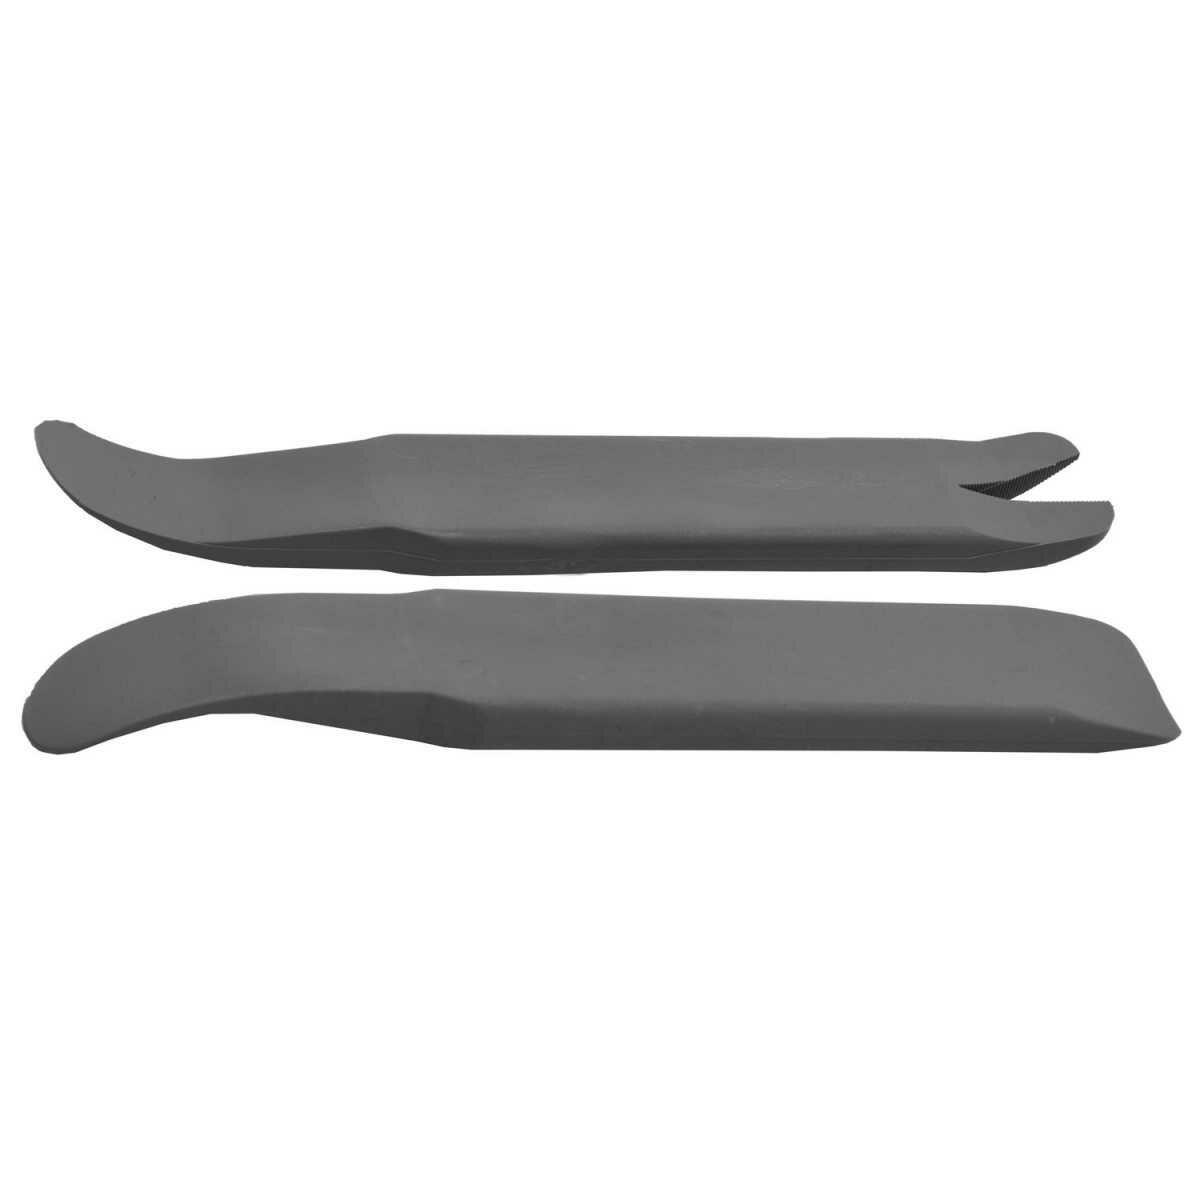 Sacador/espátula para Remover Forro de Porta Kitsaca - 2 Peças - Nylon Reforçado